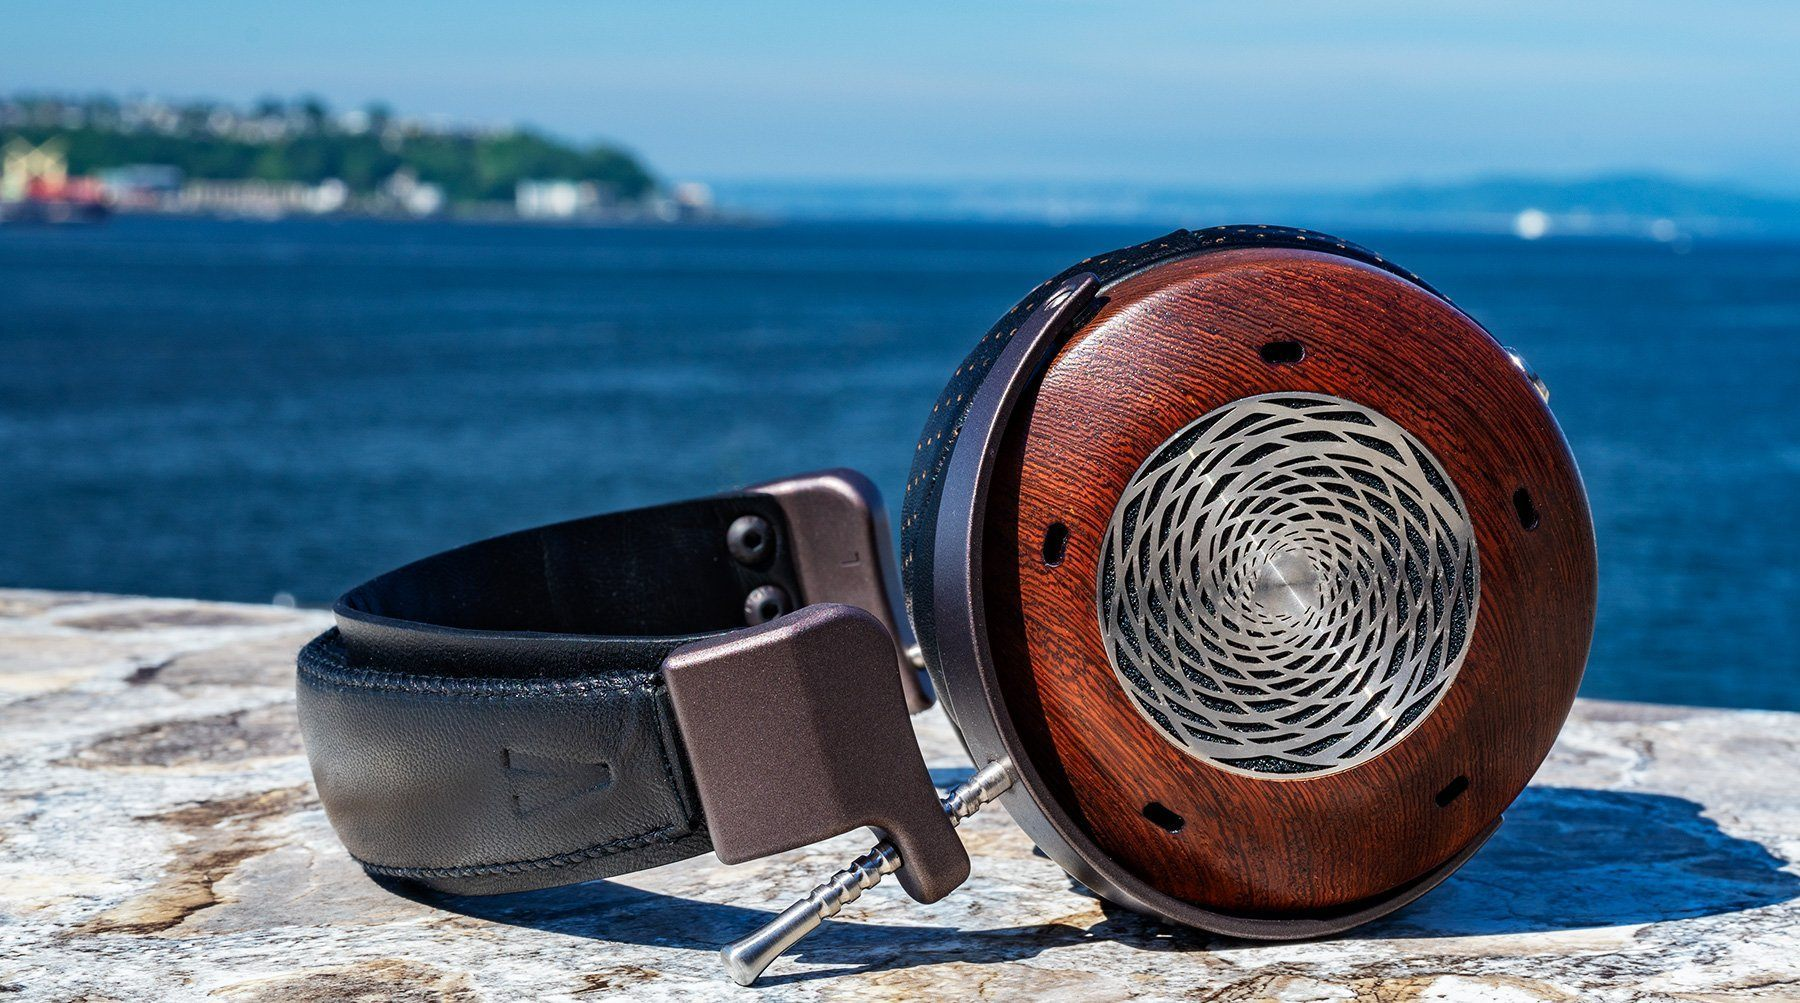 ZMF Vérité - Flagship, Artisan, Open-Back, Dynamic Headphone - Review